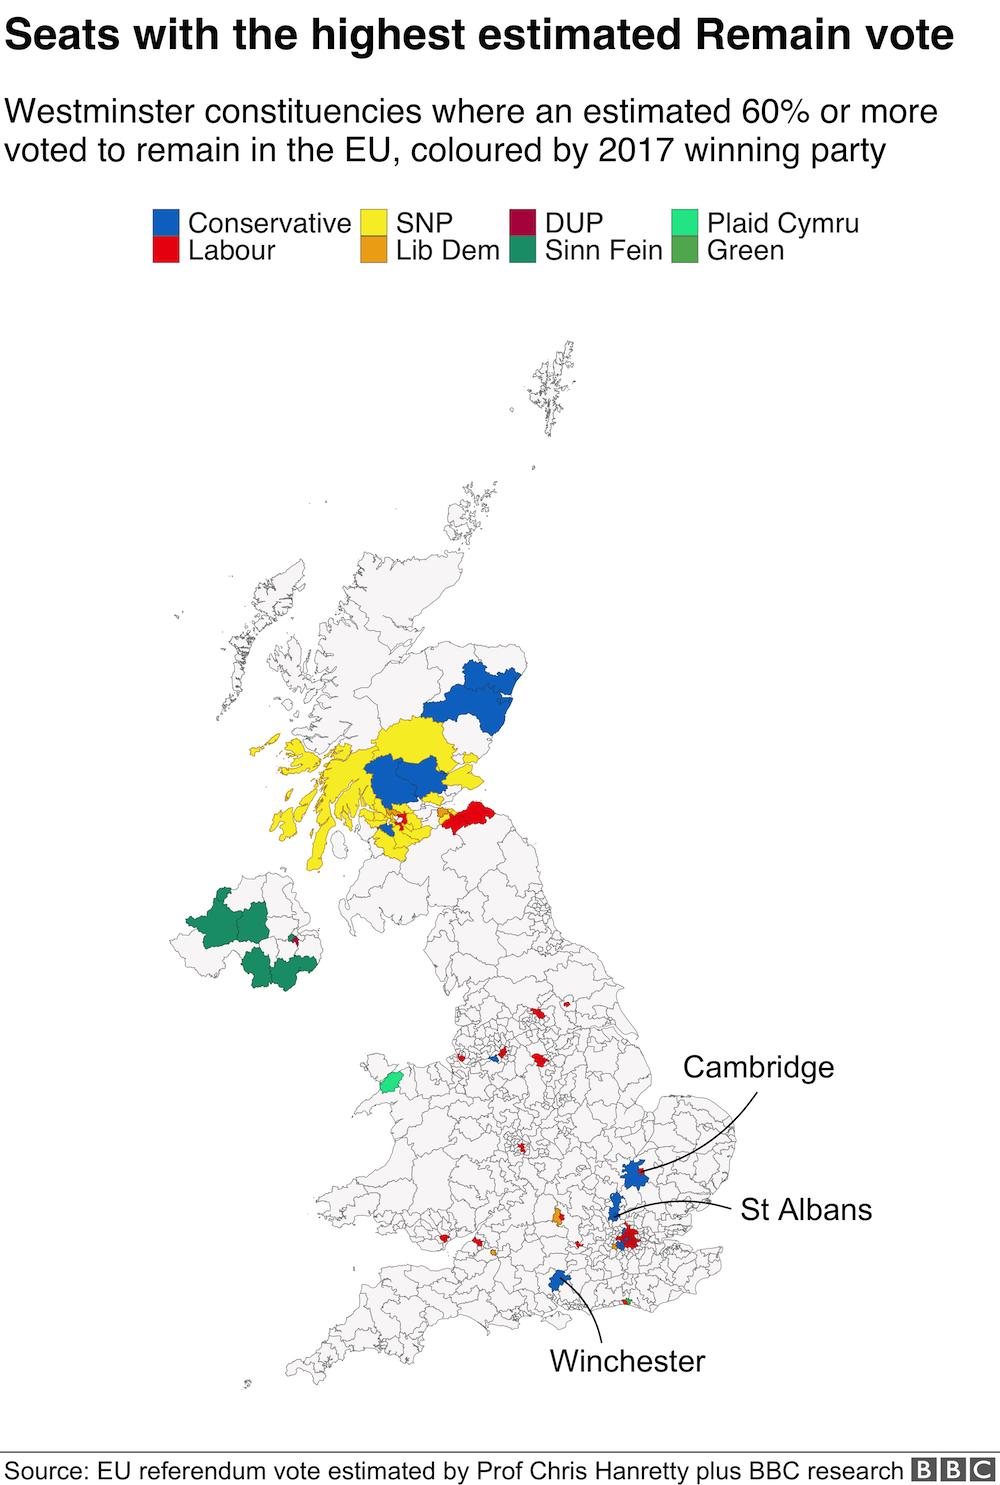 Seats the highest estimate Remain vote